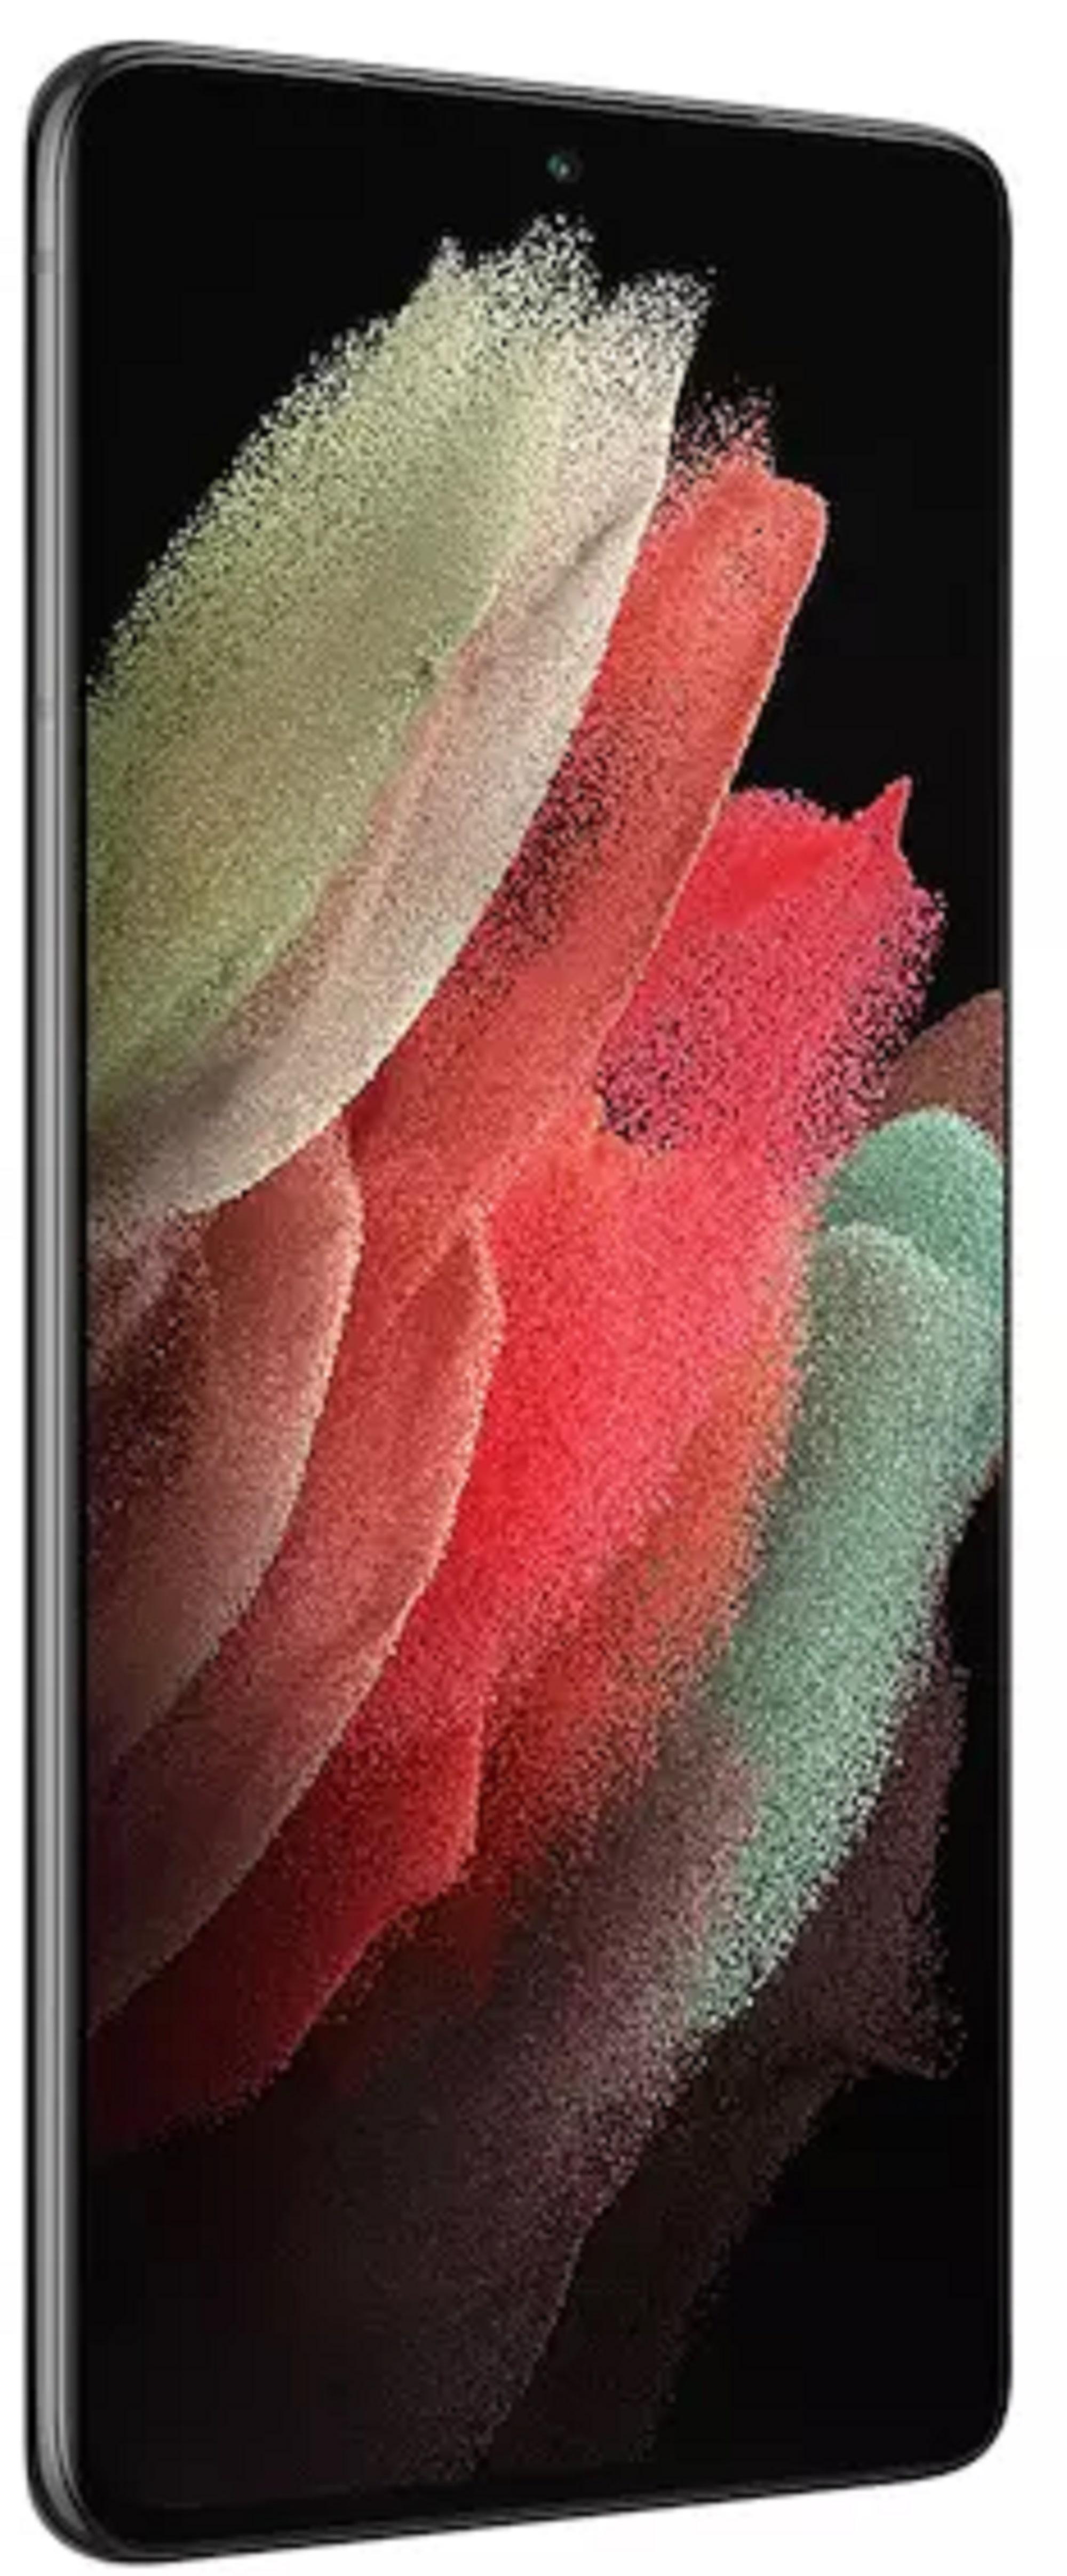 thumbnail 5 - Samsung Galaxy G998U S21 Ultra 5G 128GB Unlocked Smartphone - Excellent